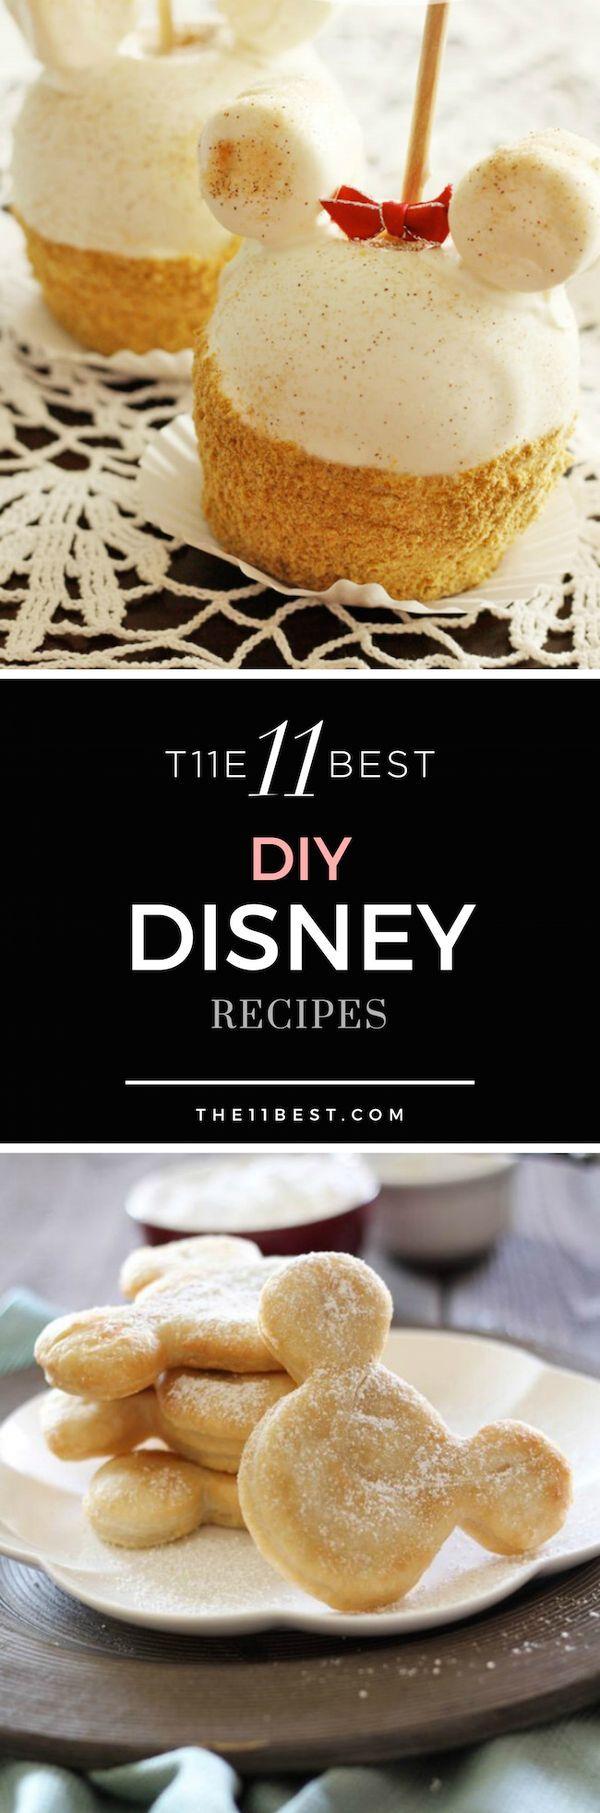 DIY Disney Recipe Ideas